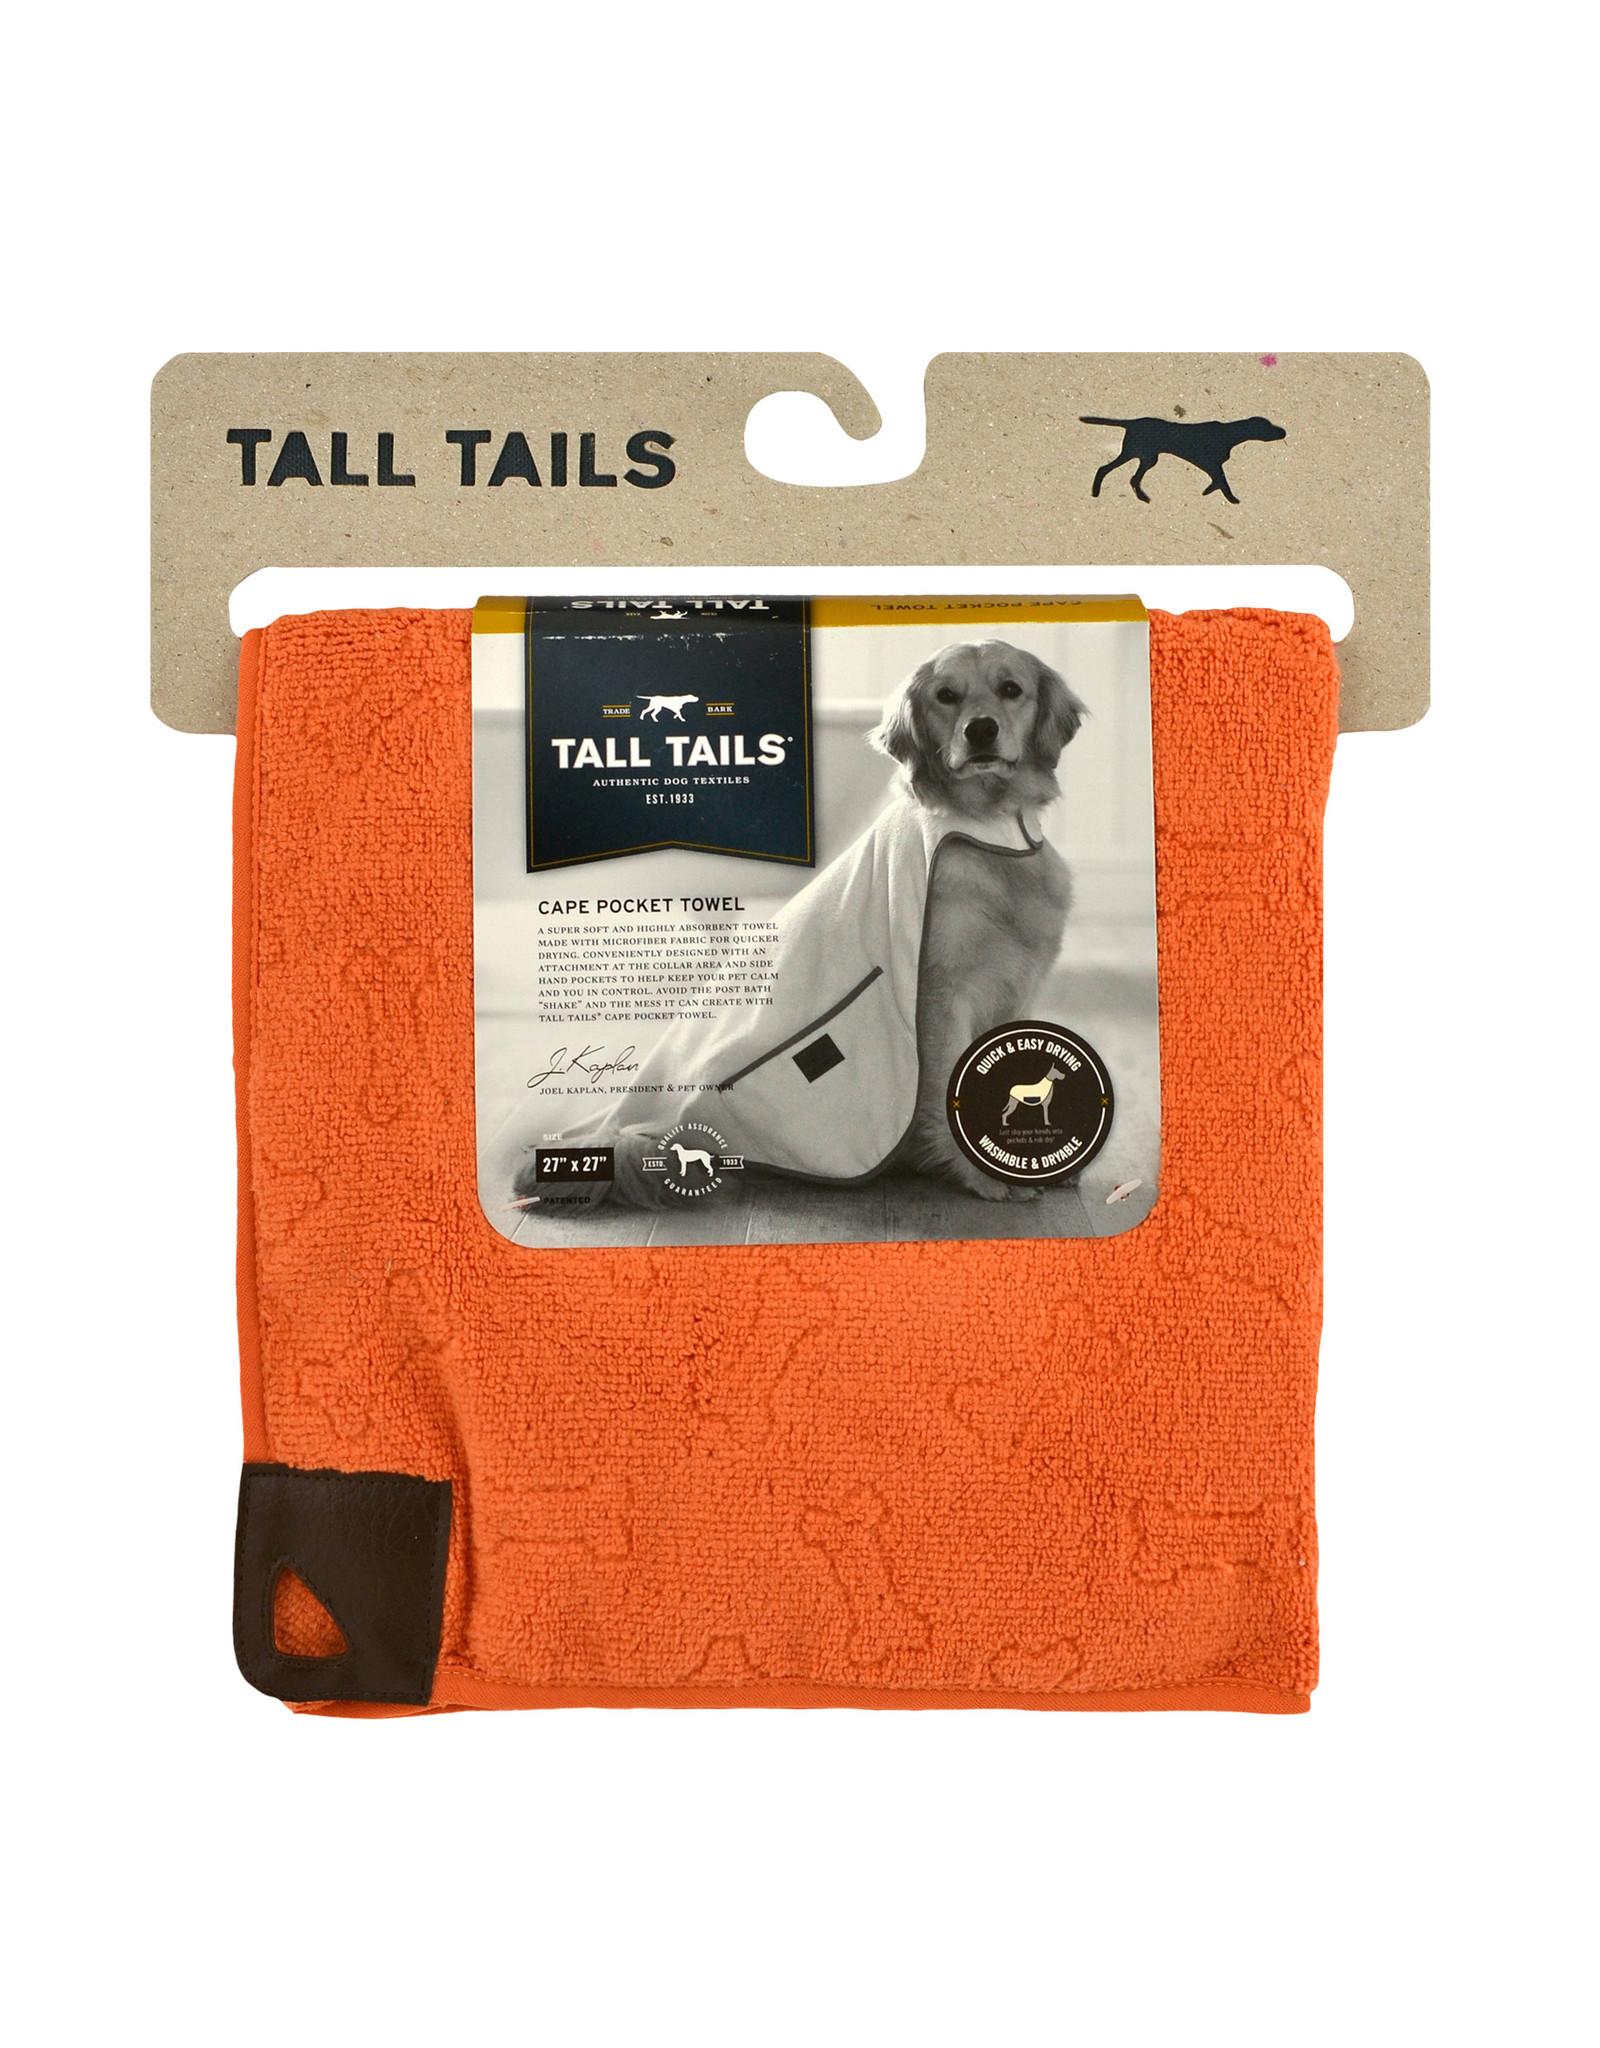 Pet Cape Pocket Towel, 27x27, orange bone